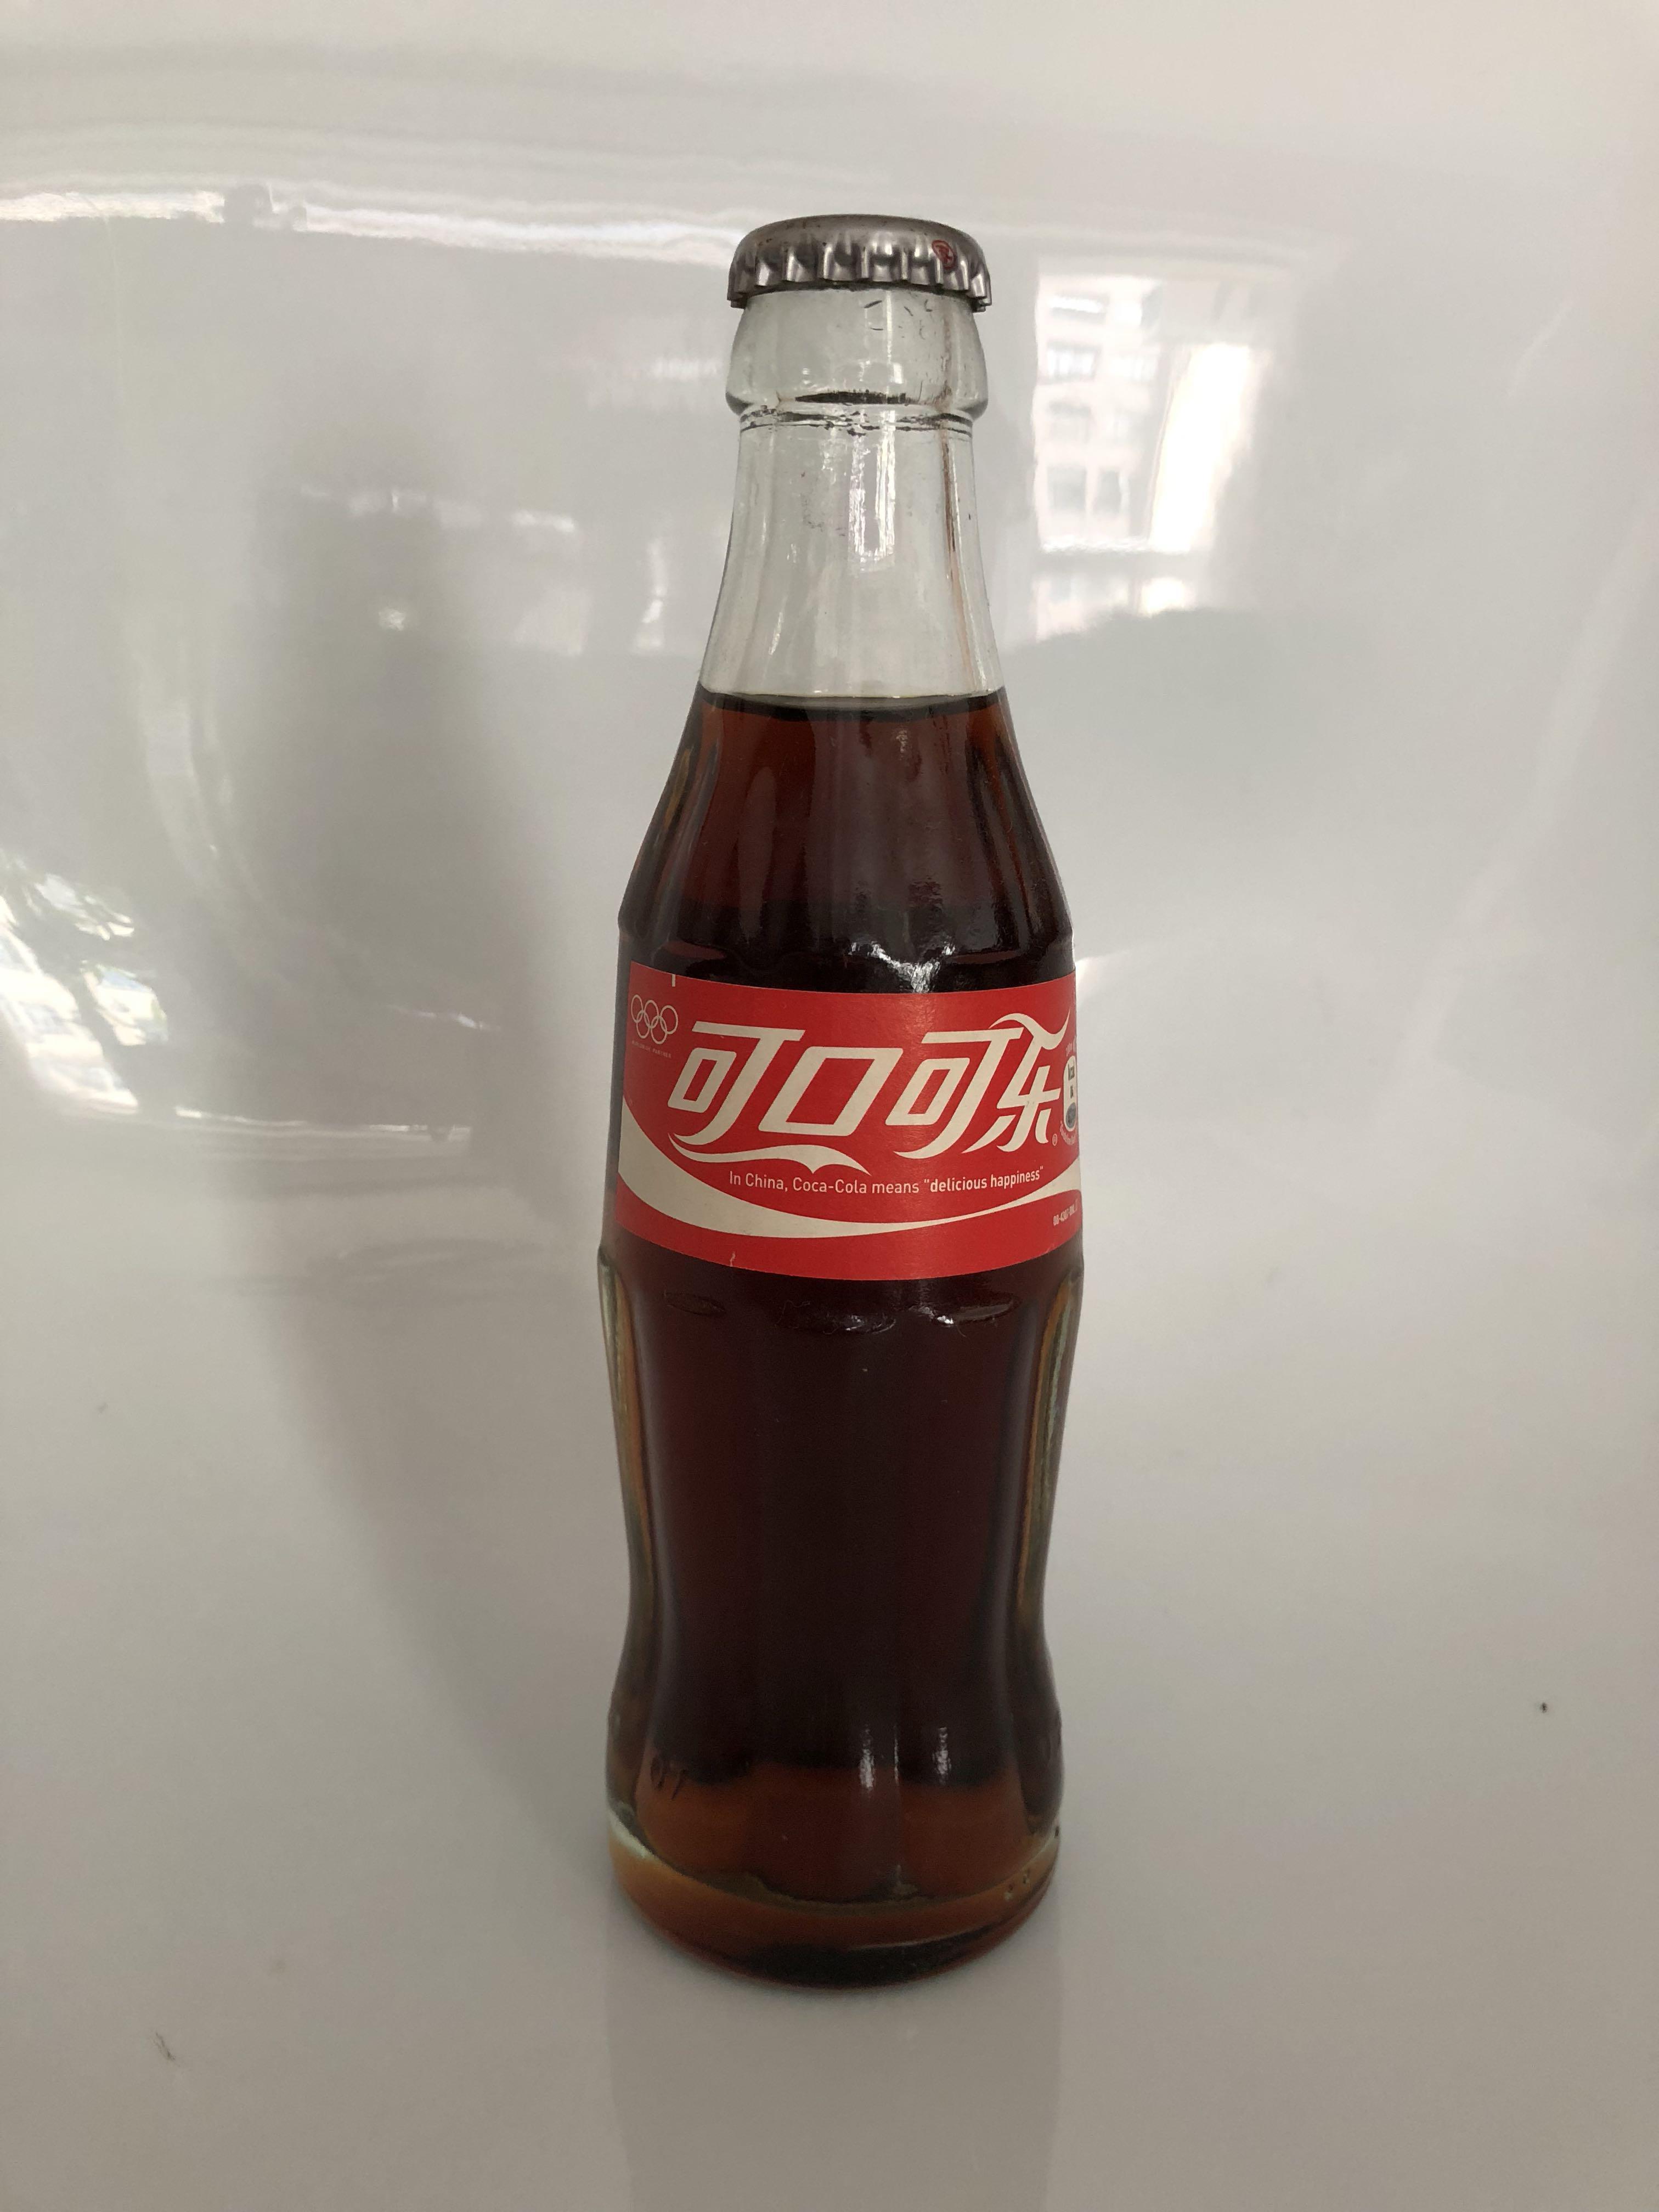 可口可樂 Coca Cola Bottle from Belgium